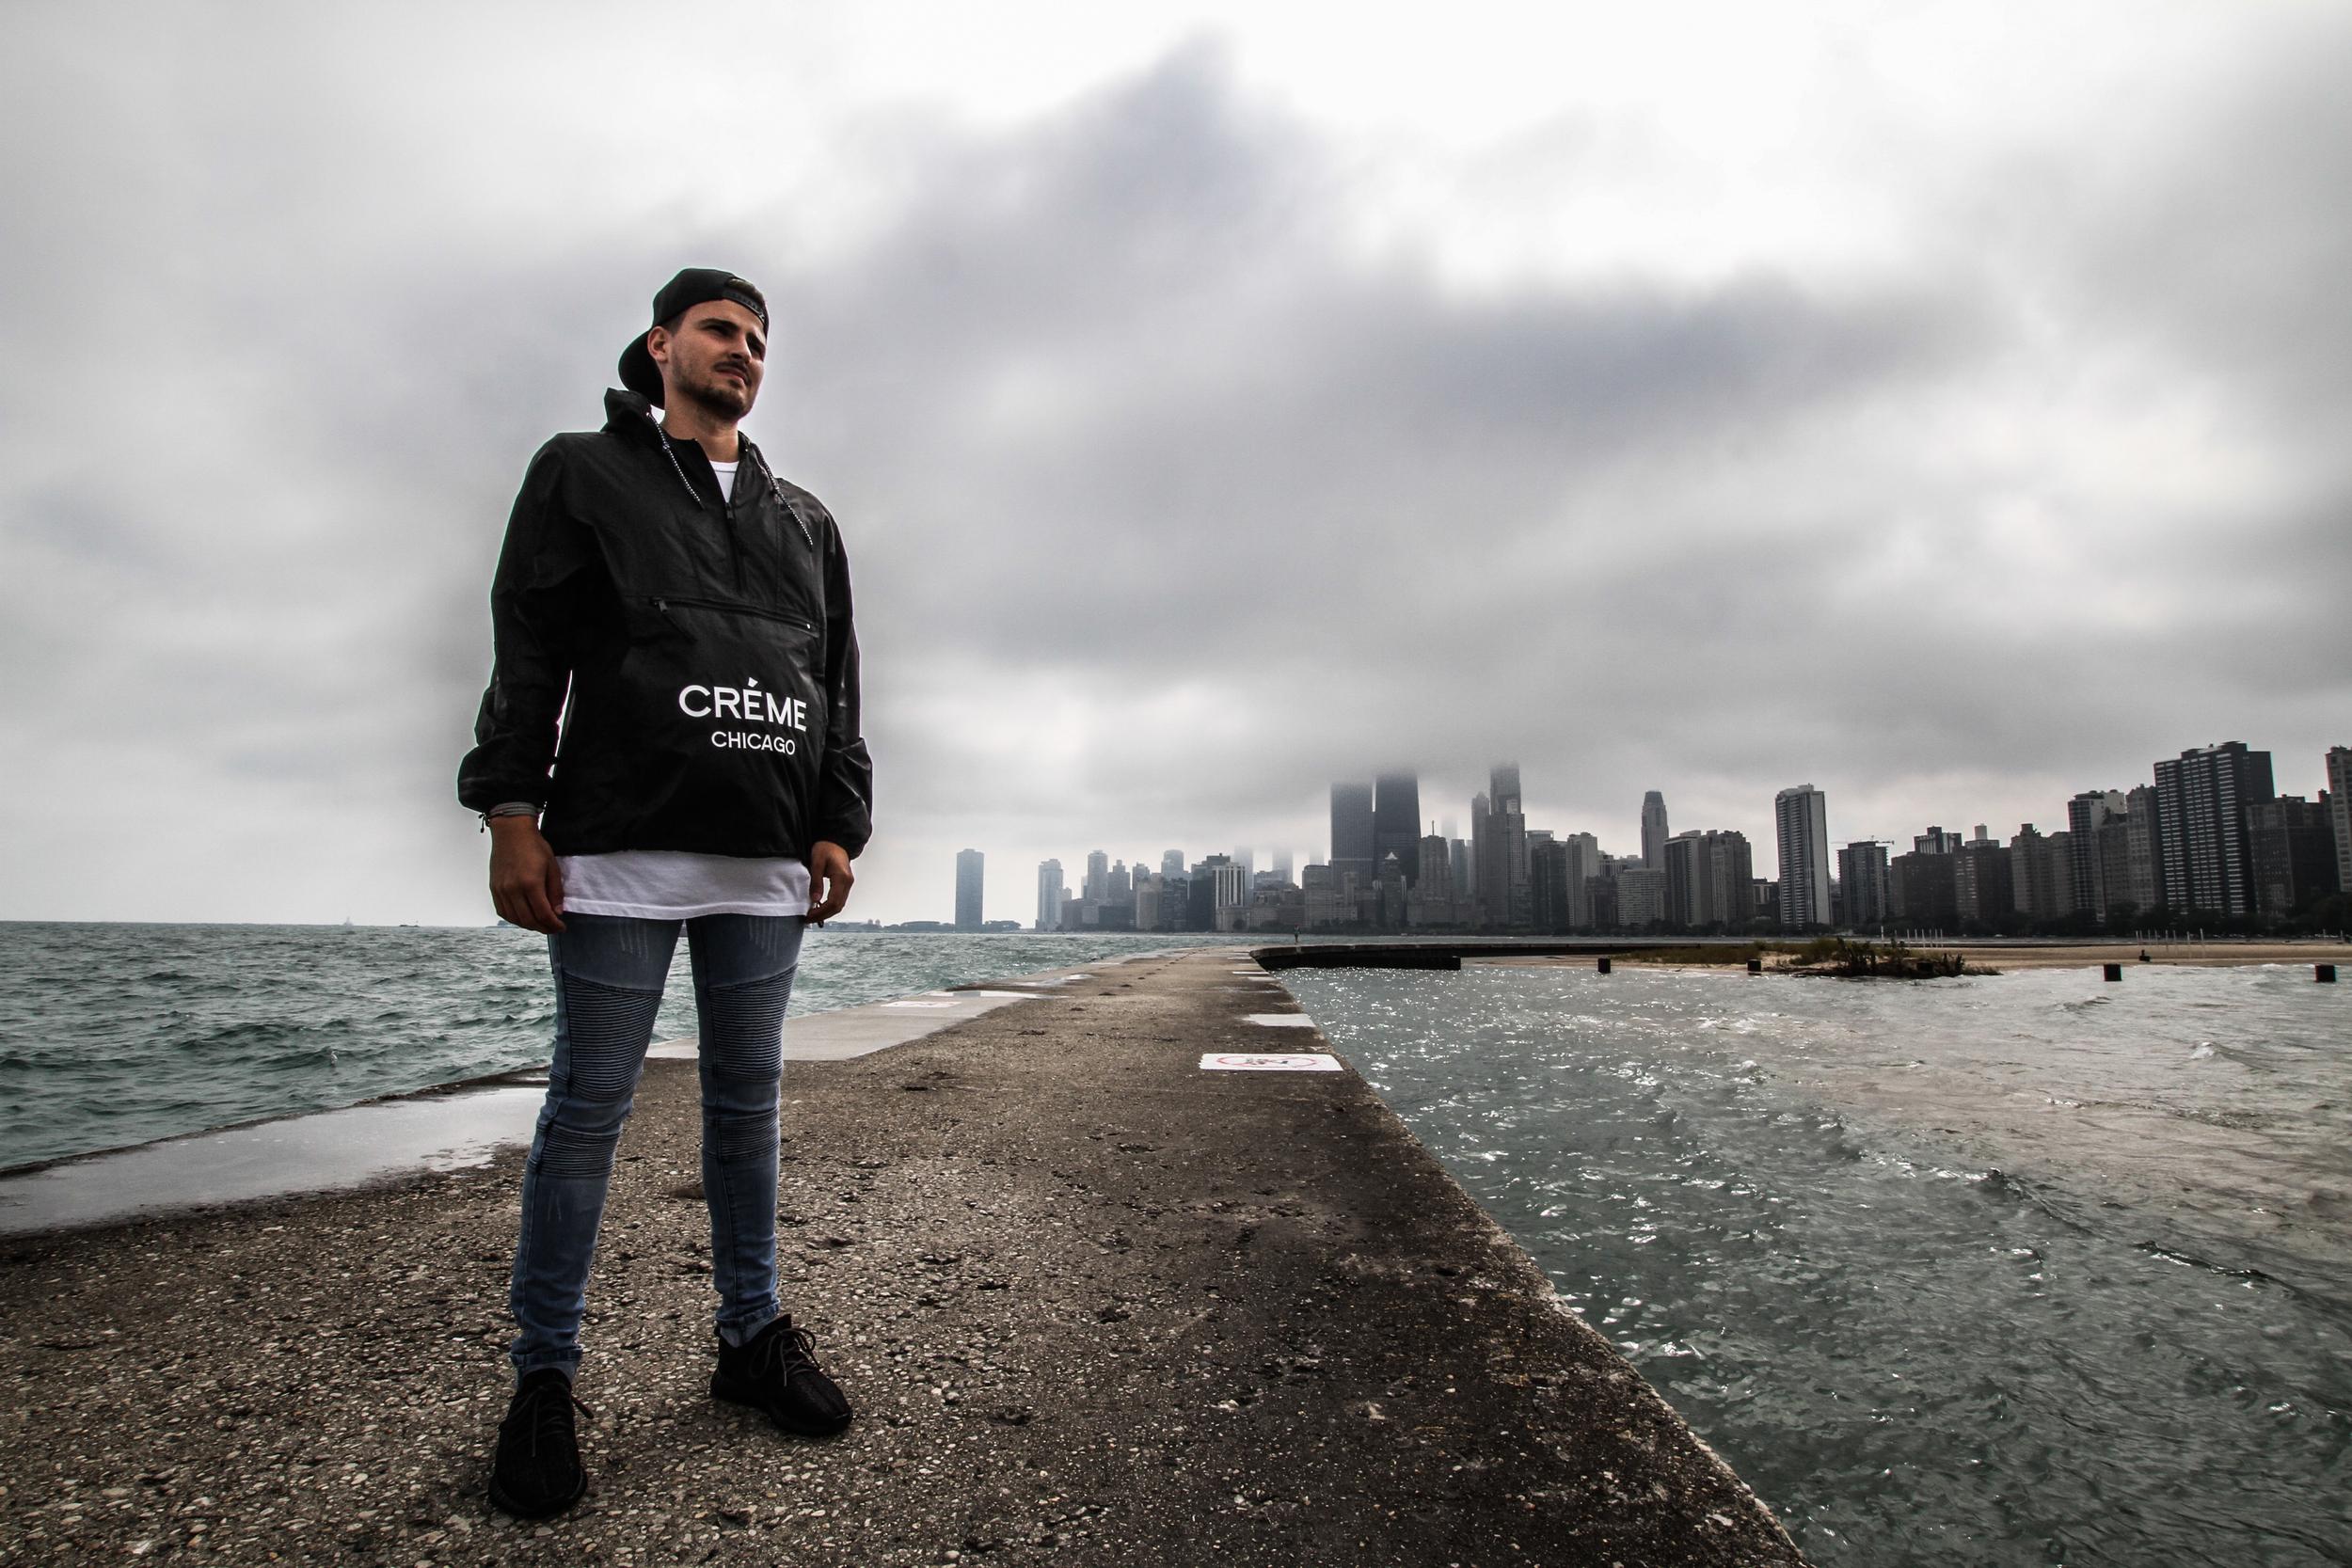 Creme Chicago